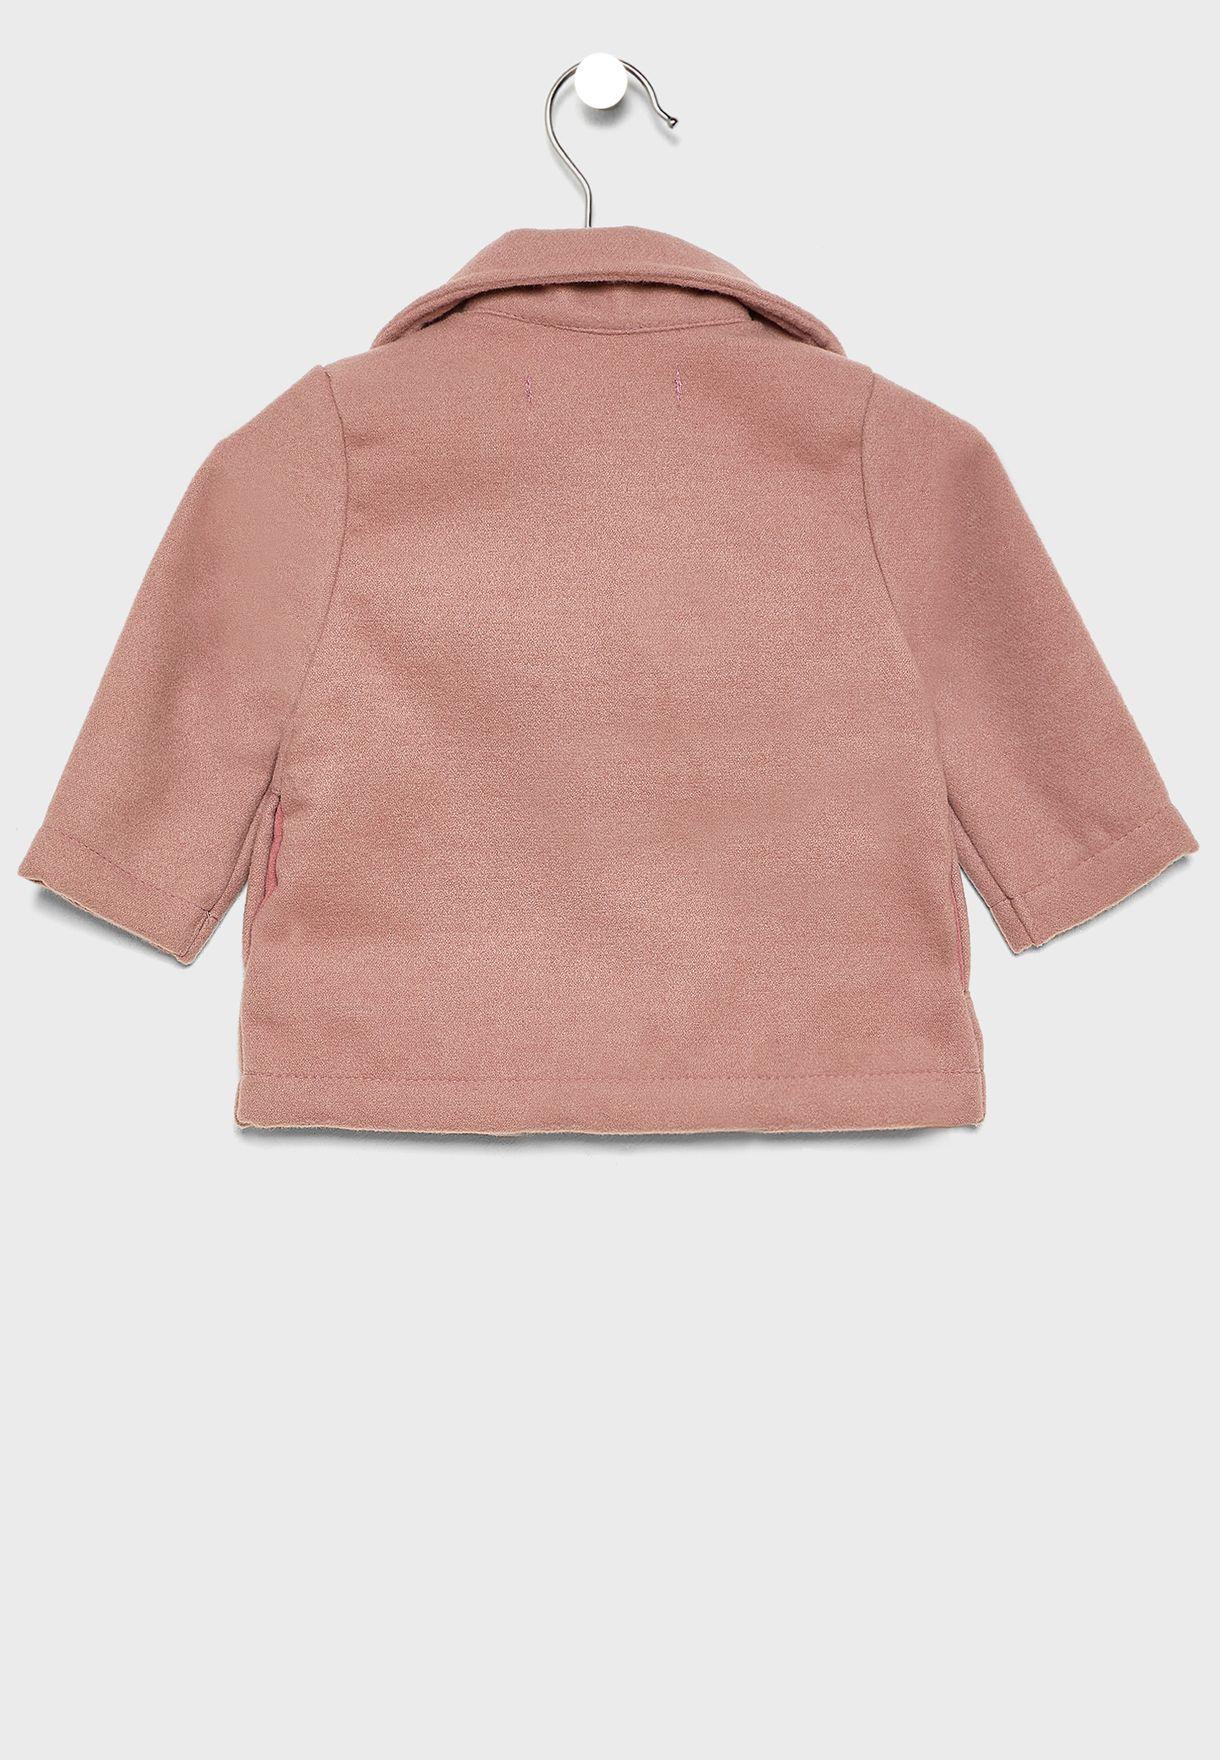 Kids Button Detail Jacket